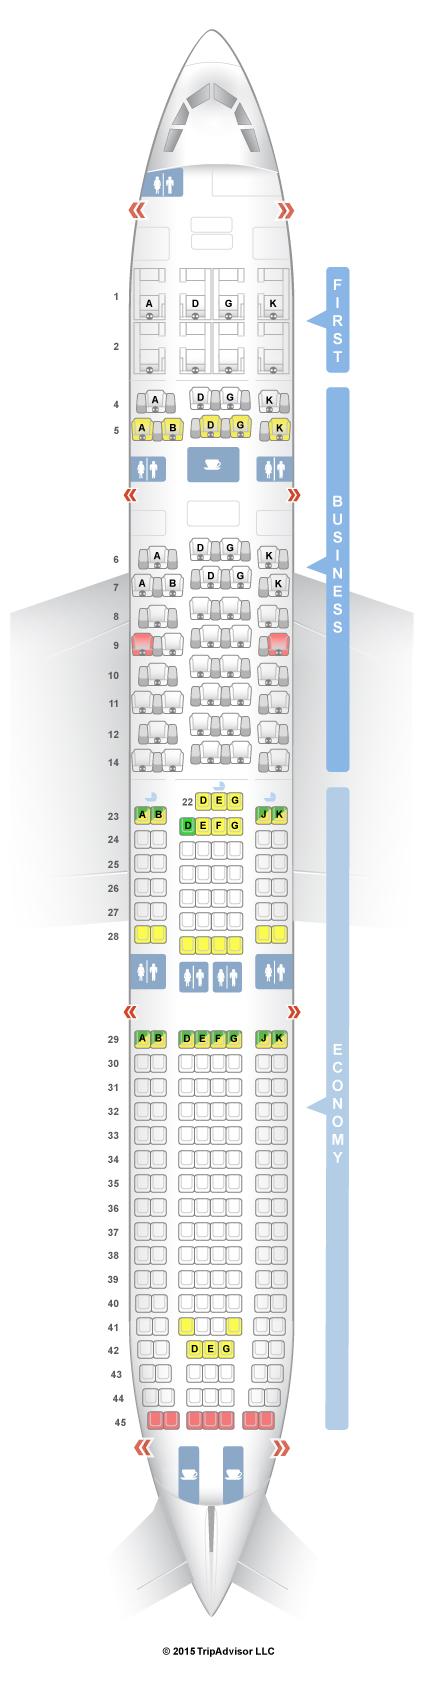 seatguru seat map swiss airbus a330 300 333